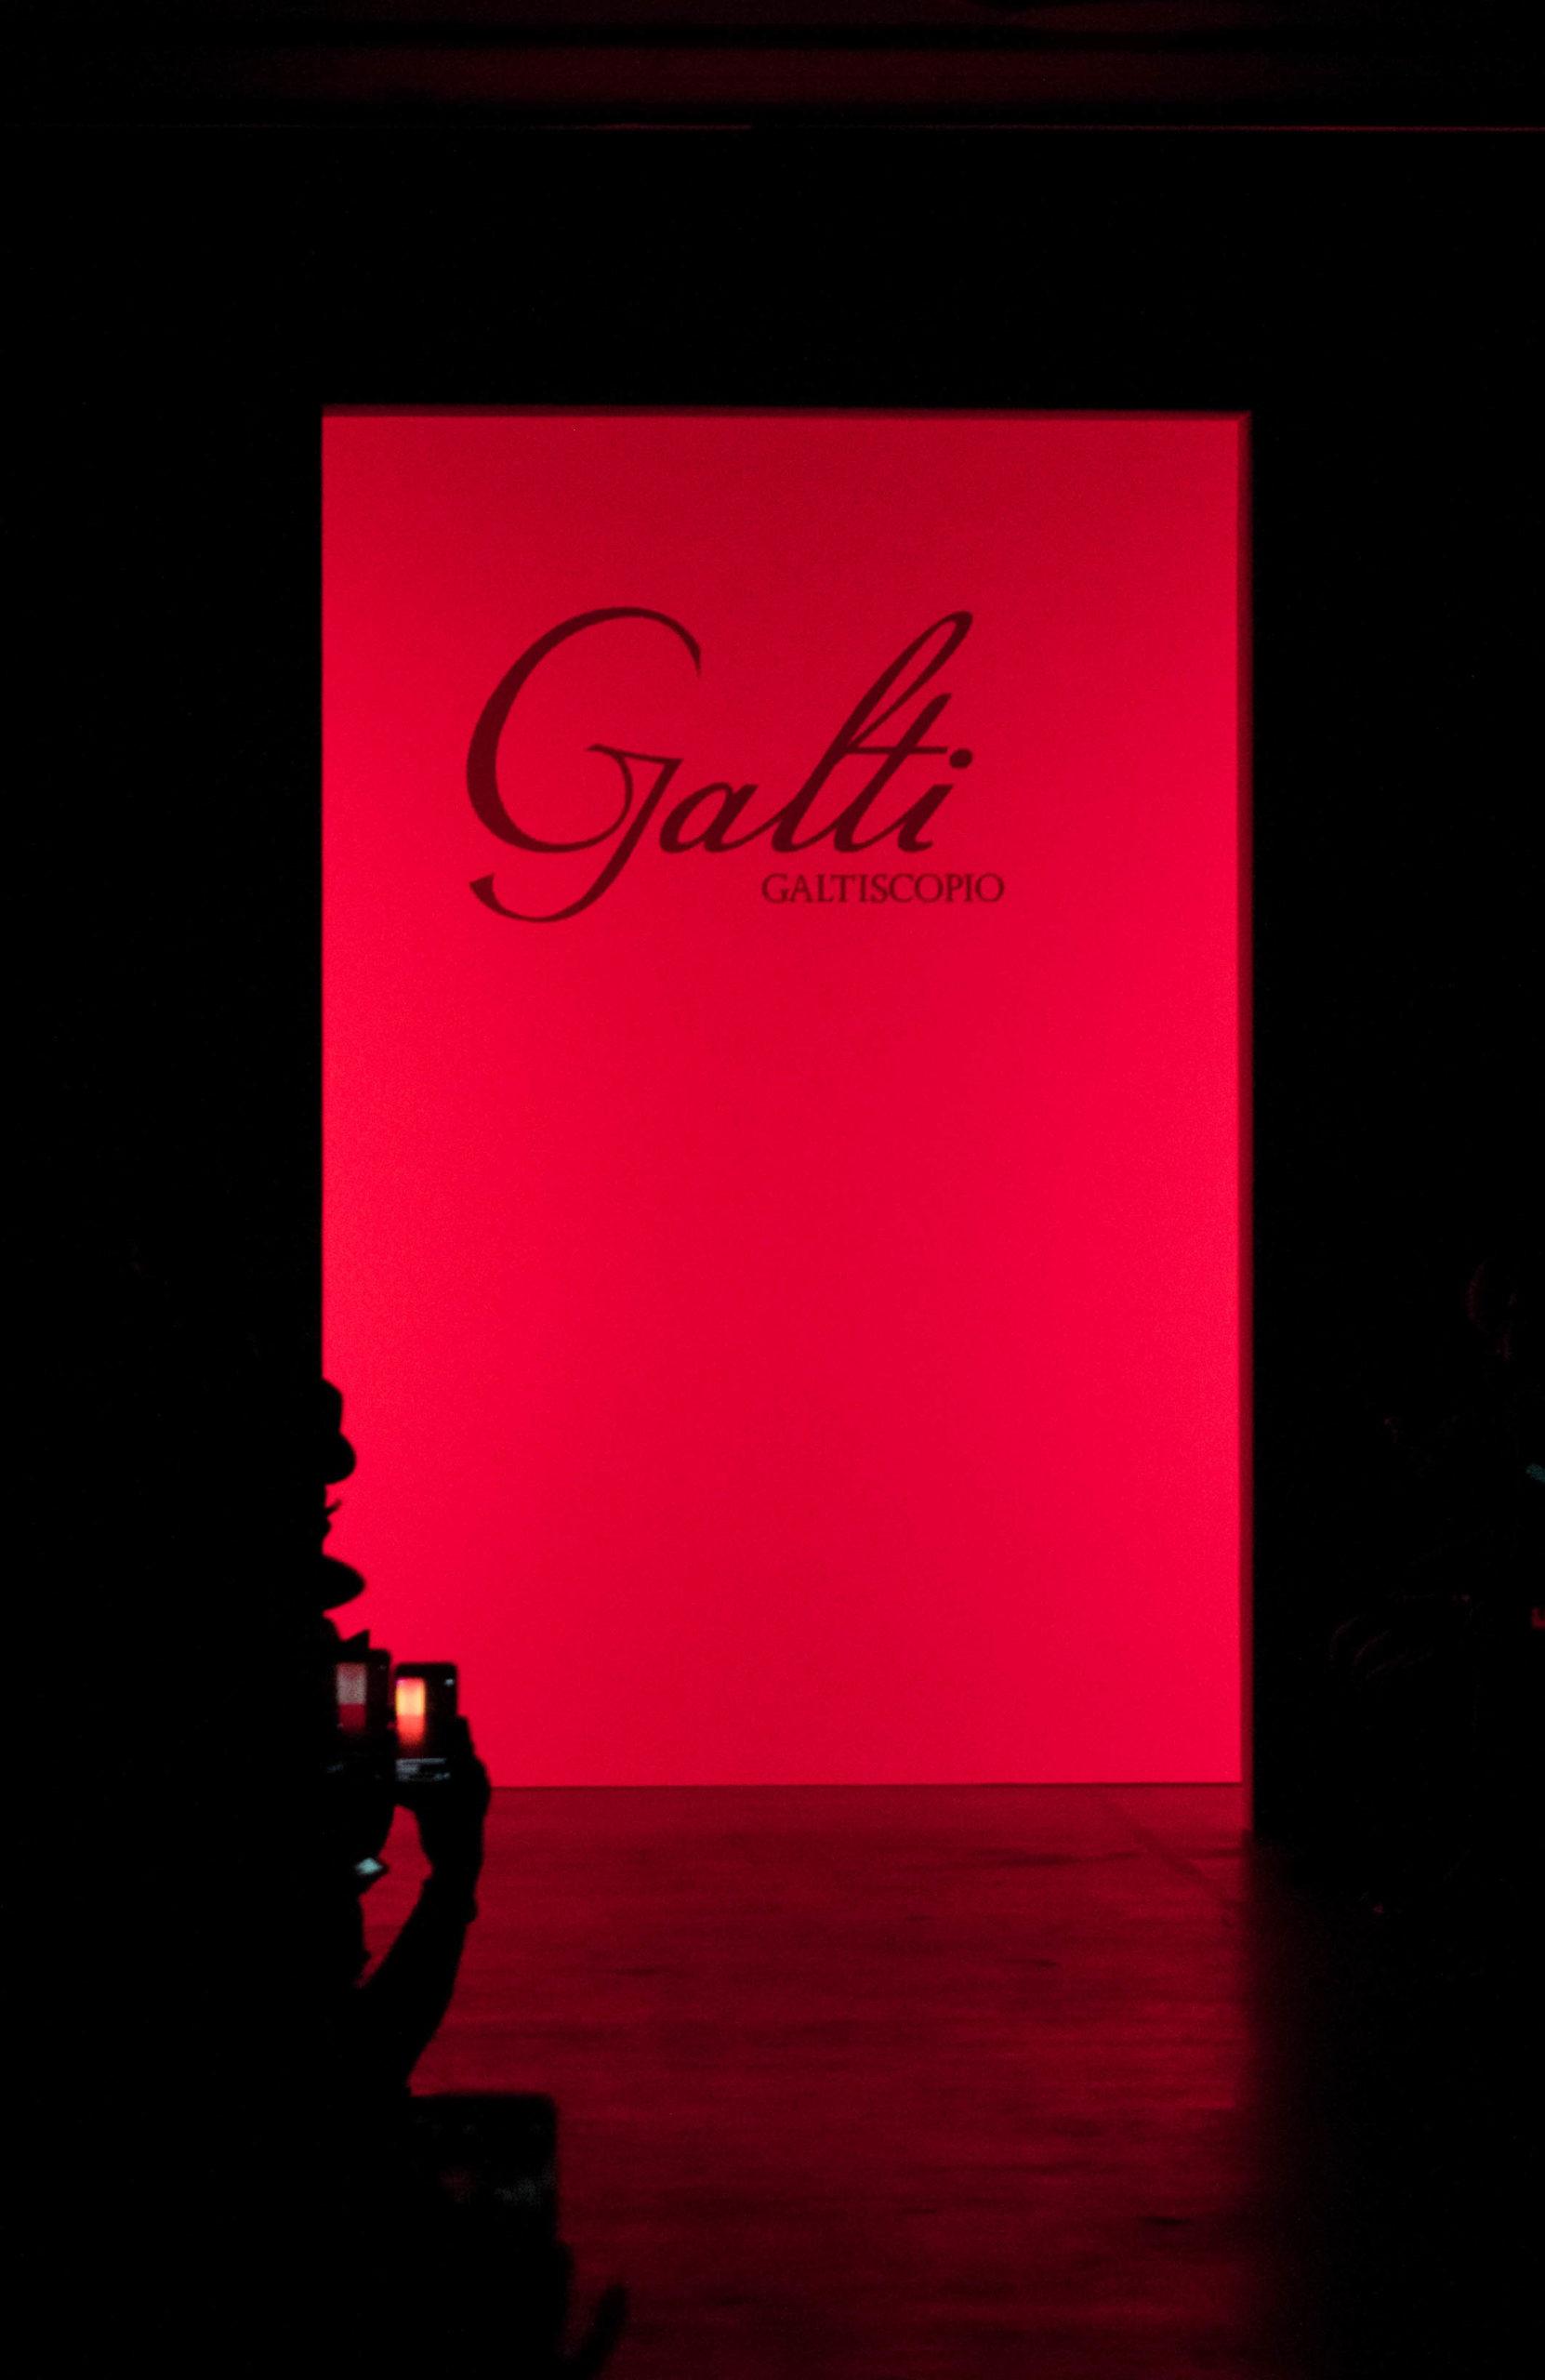 Galti by Galtiscopio ss18